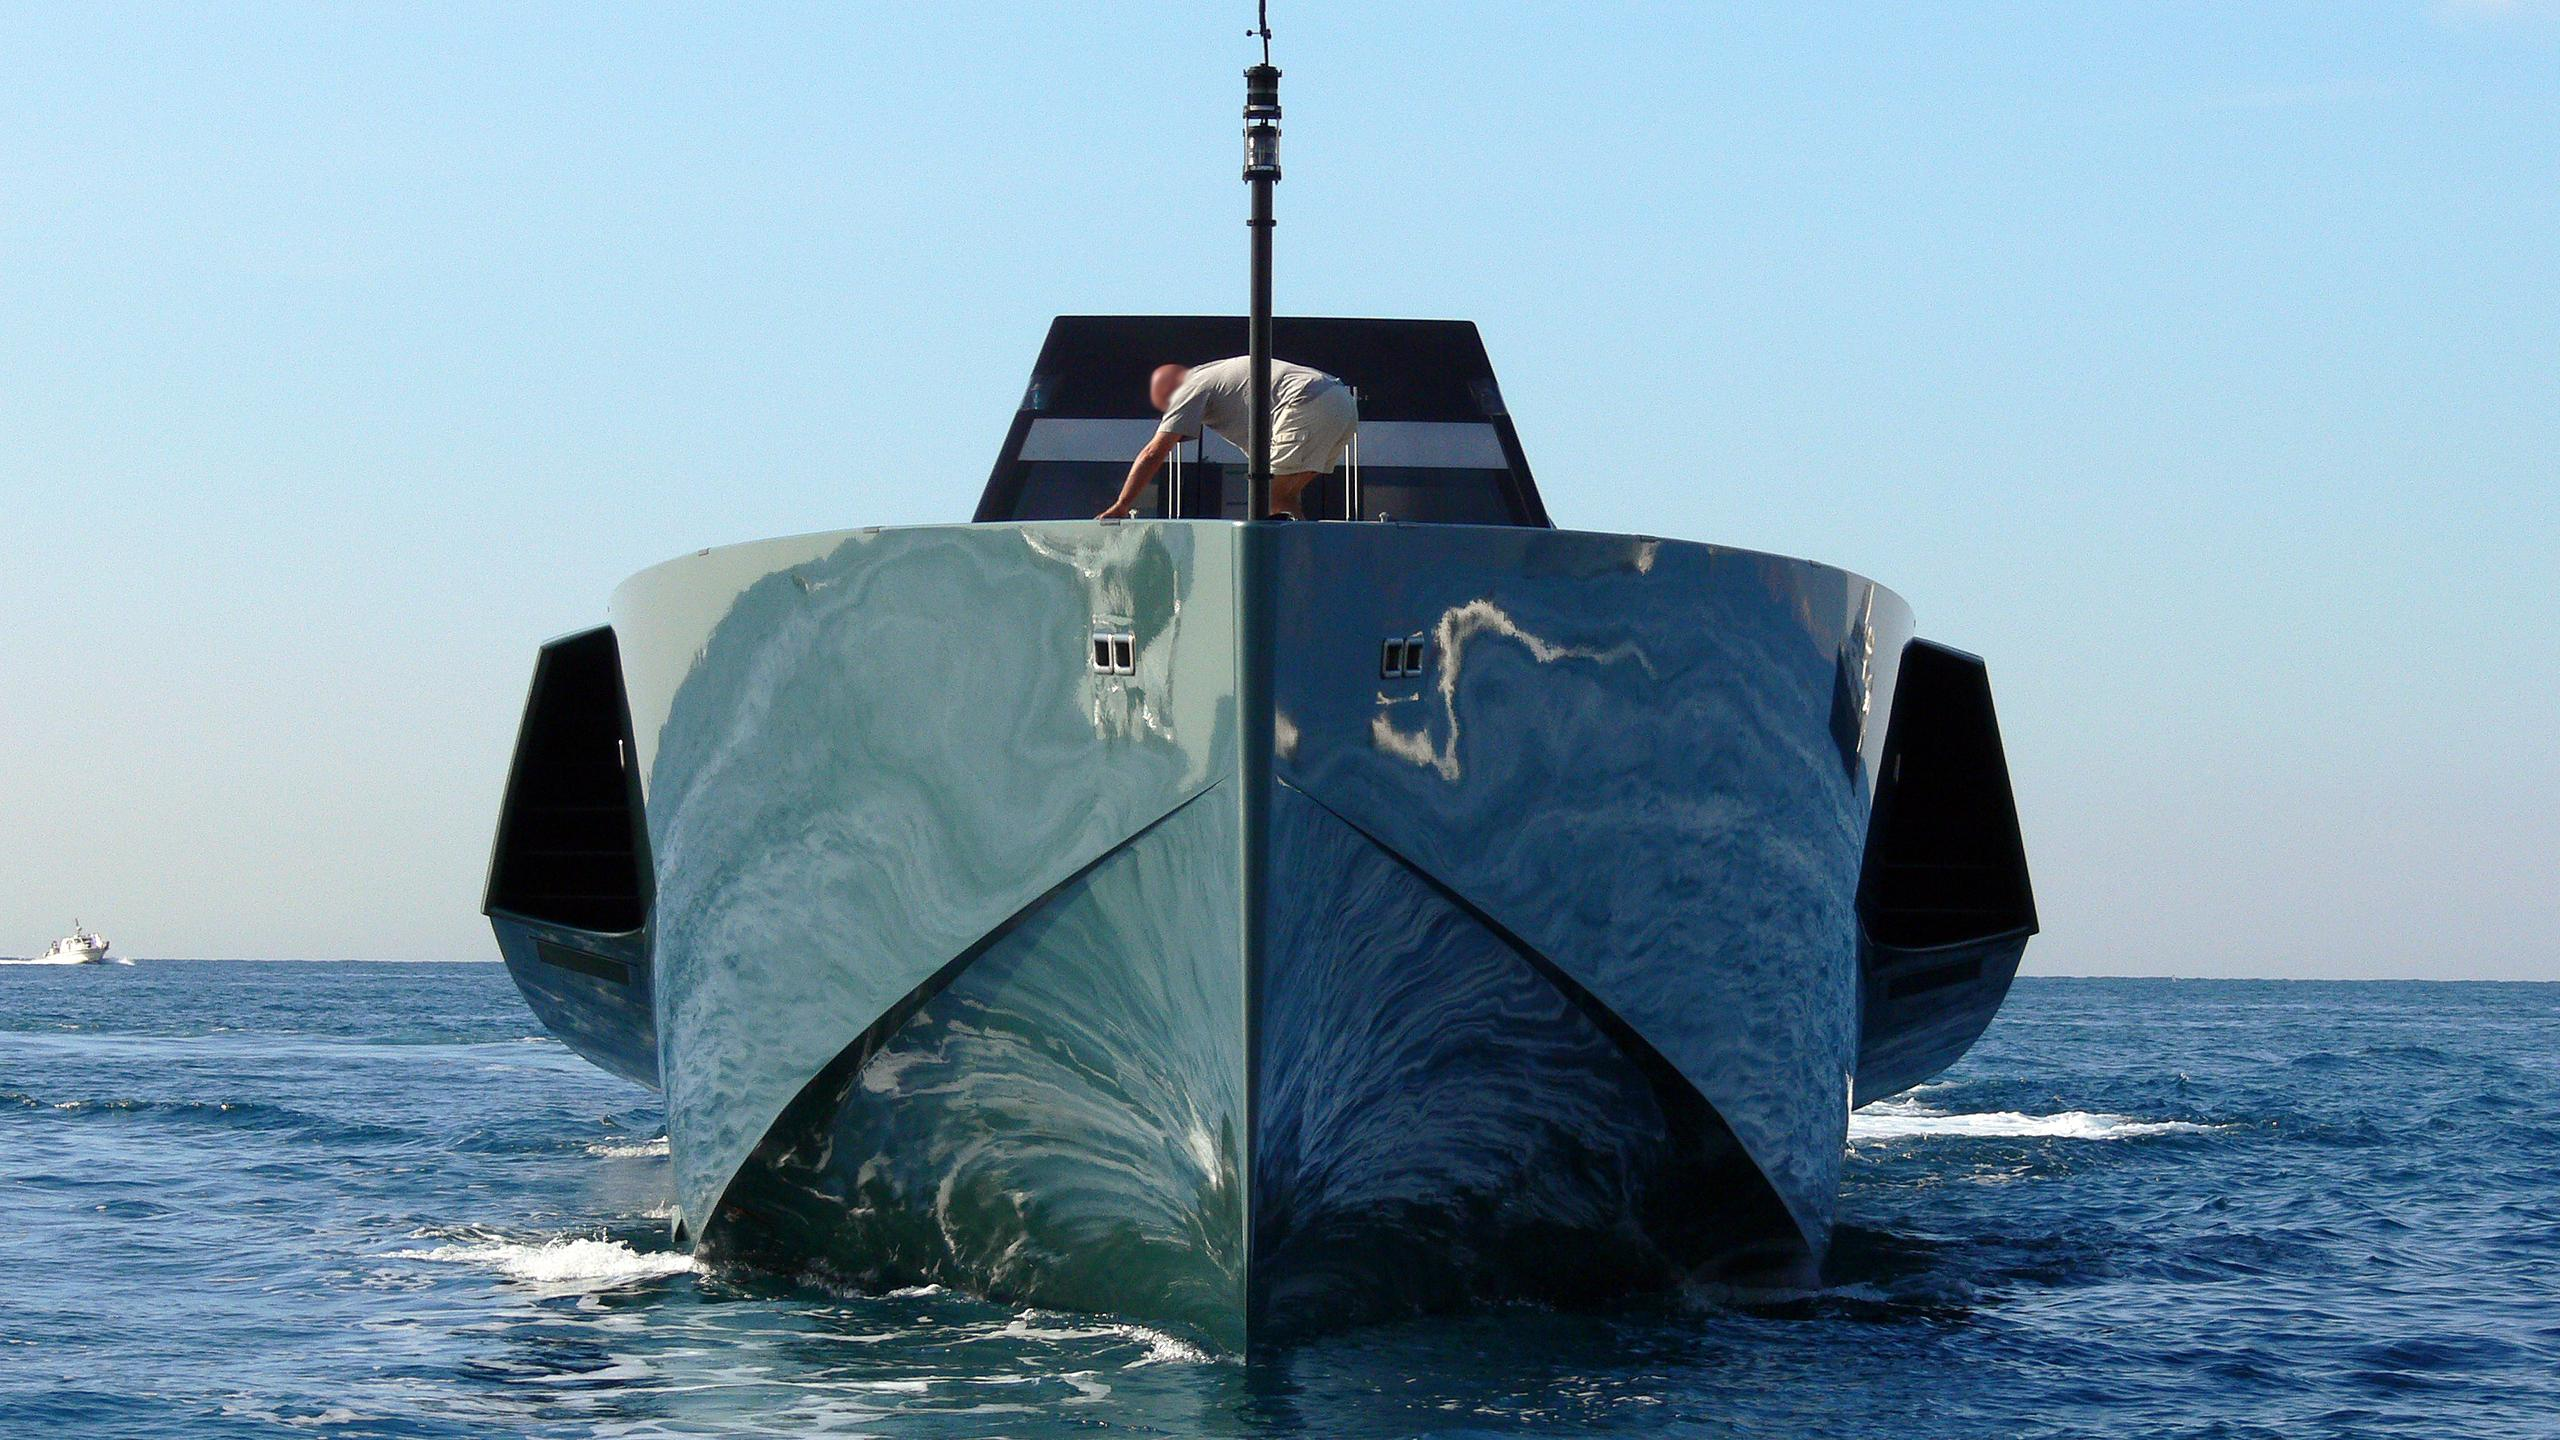 galeocerdo-motor-yacht-wally-power-118-2003-36m-bow.